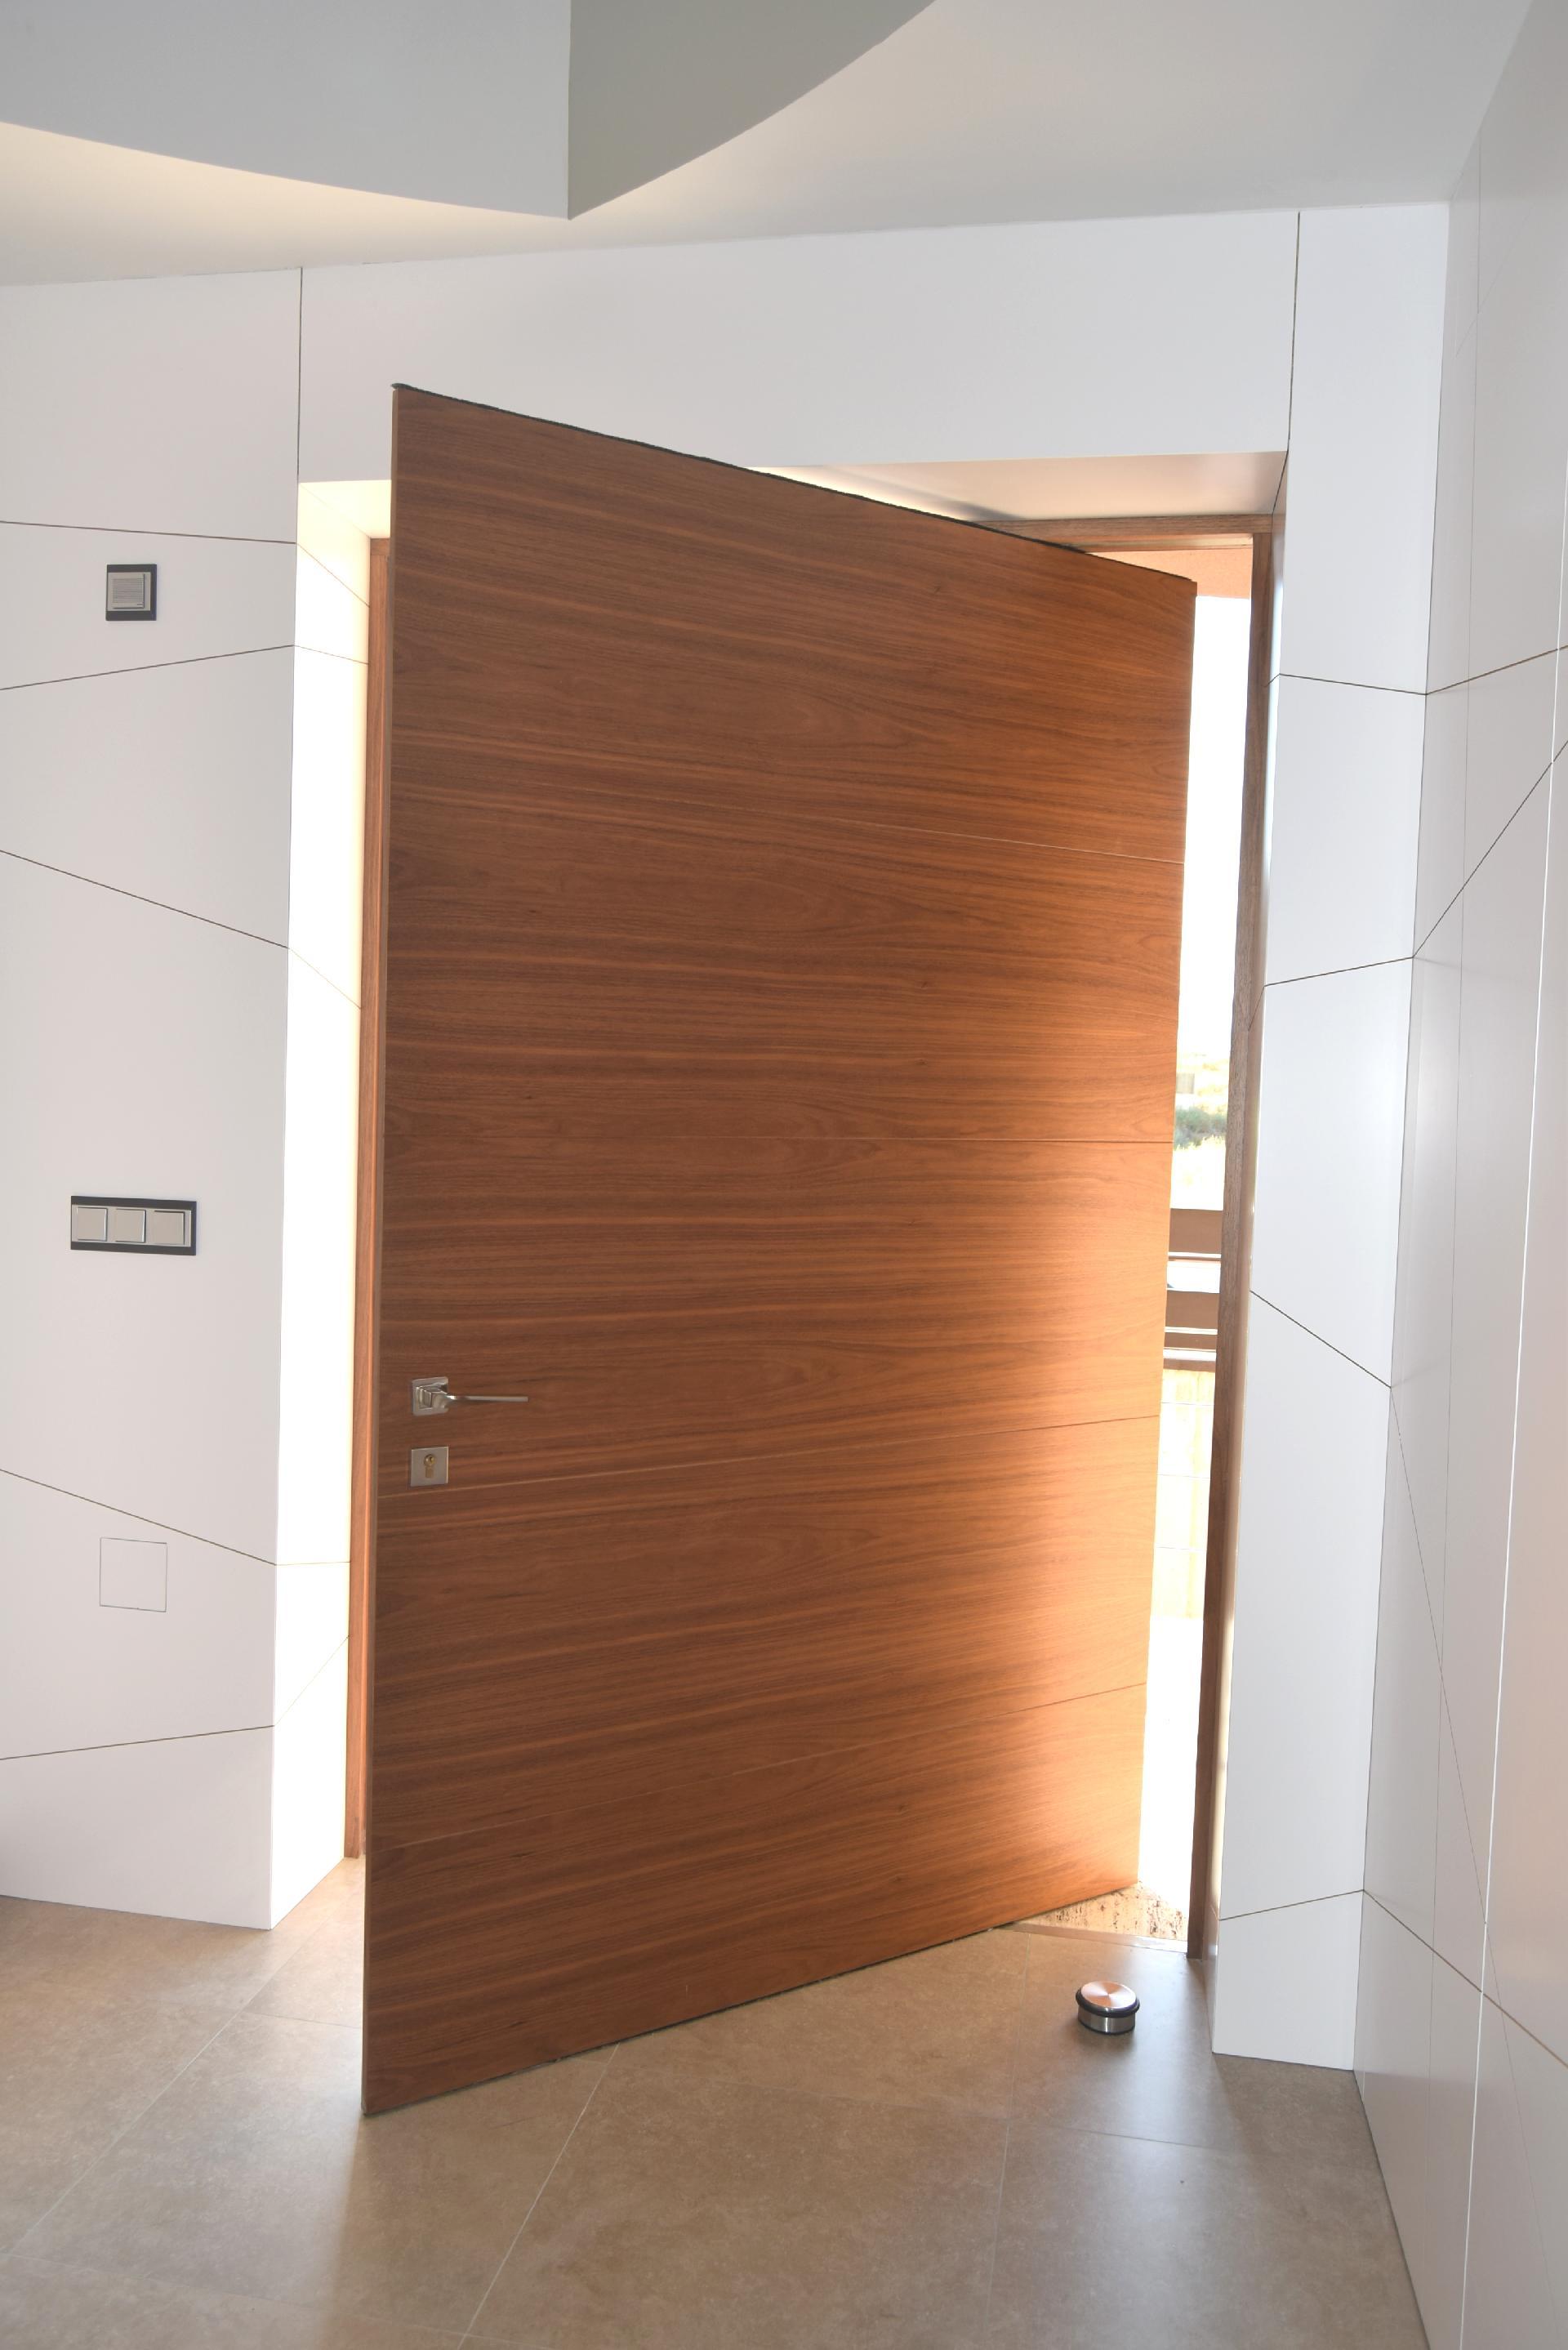 puerta pivotante de entrada en etimoe - Puerta Pivotante